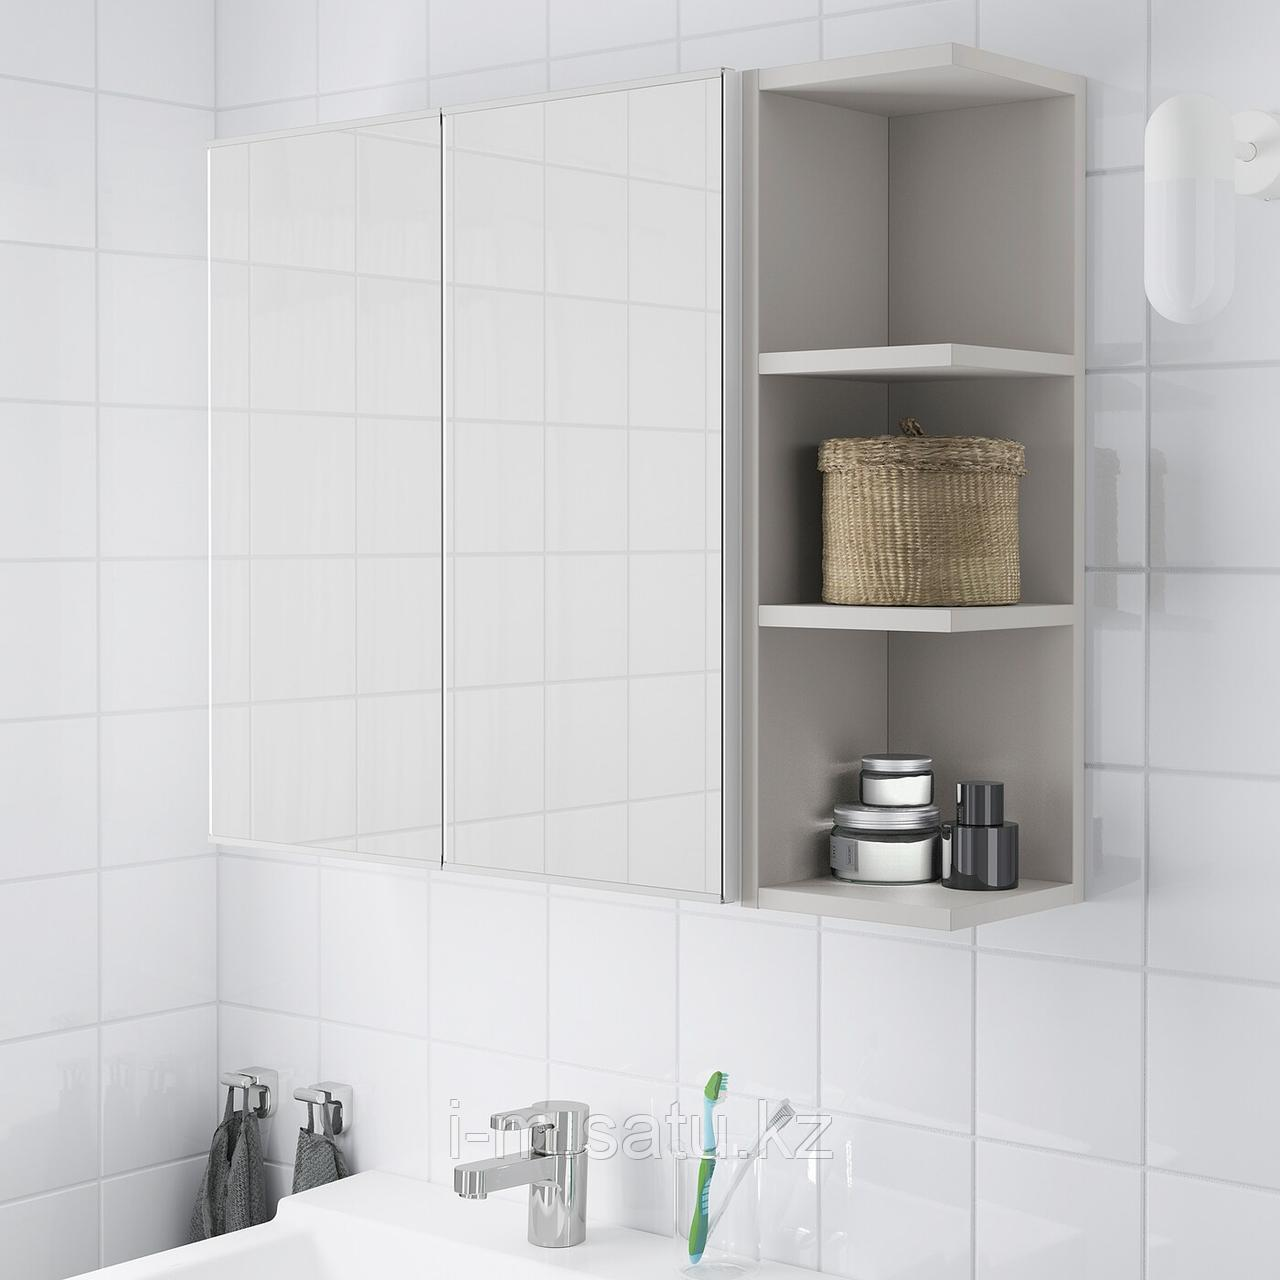 ЛИЛЛОНГЕН Зеркальн шкафч с 2 дврц/1 откр полк, белый, серый, 79x21x64 см